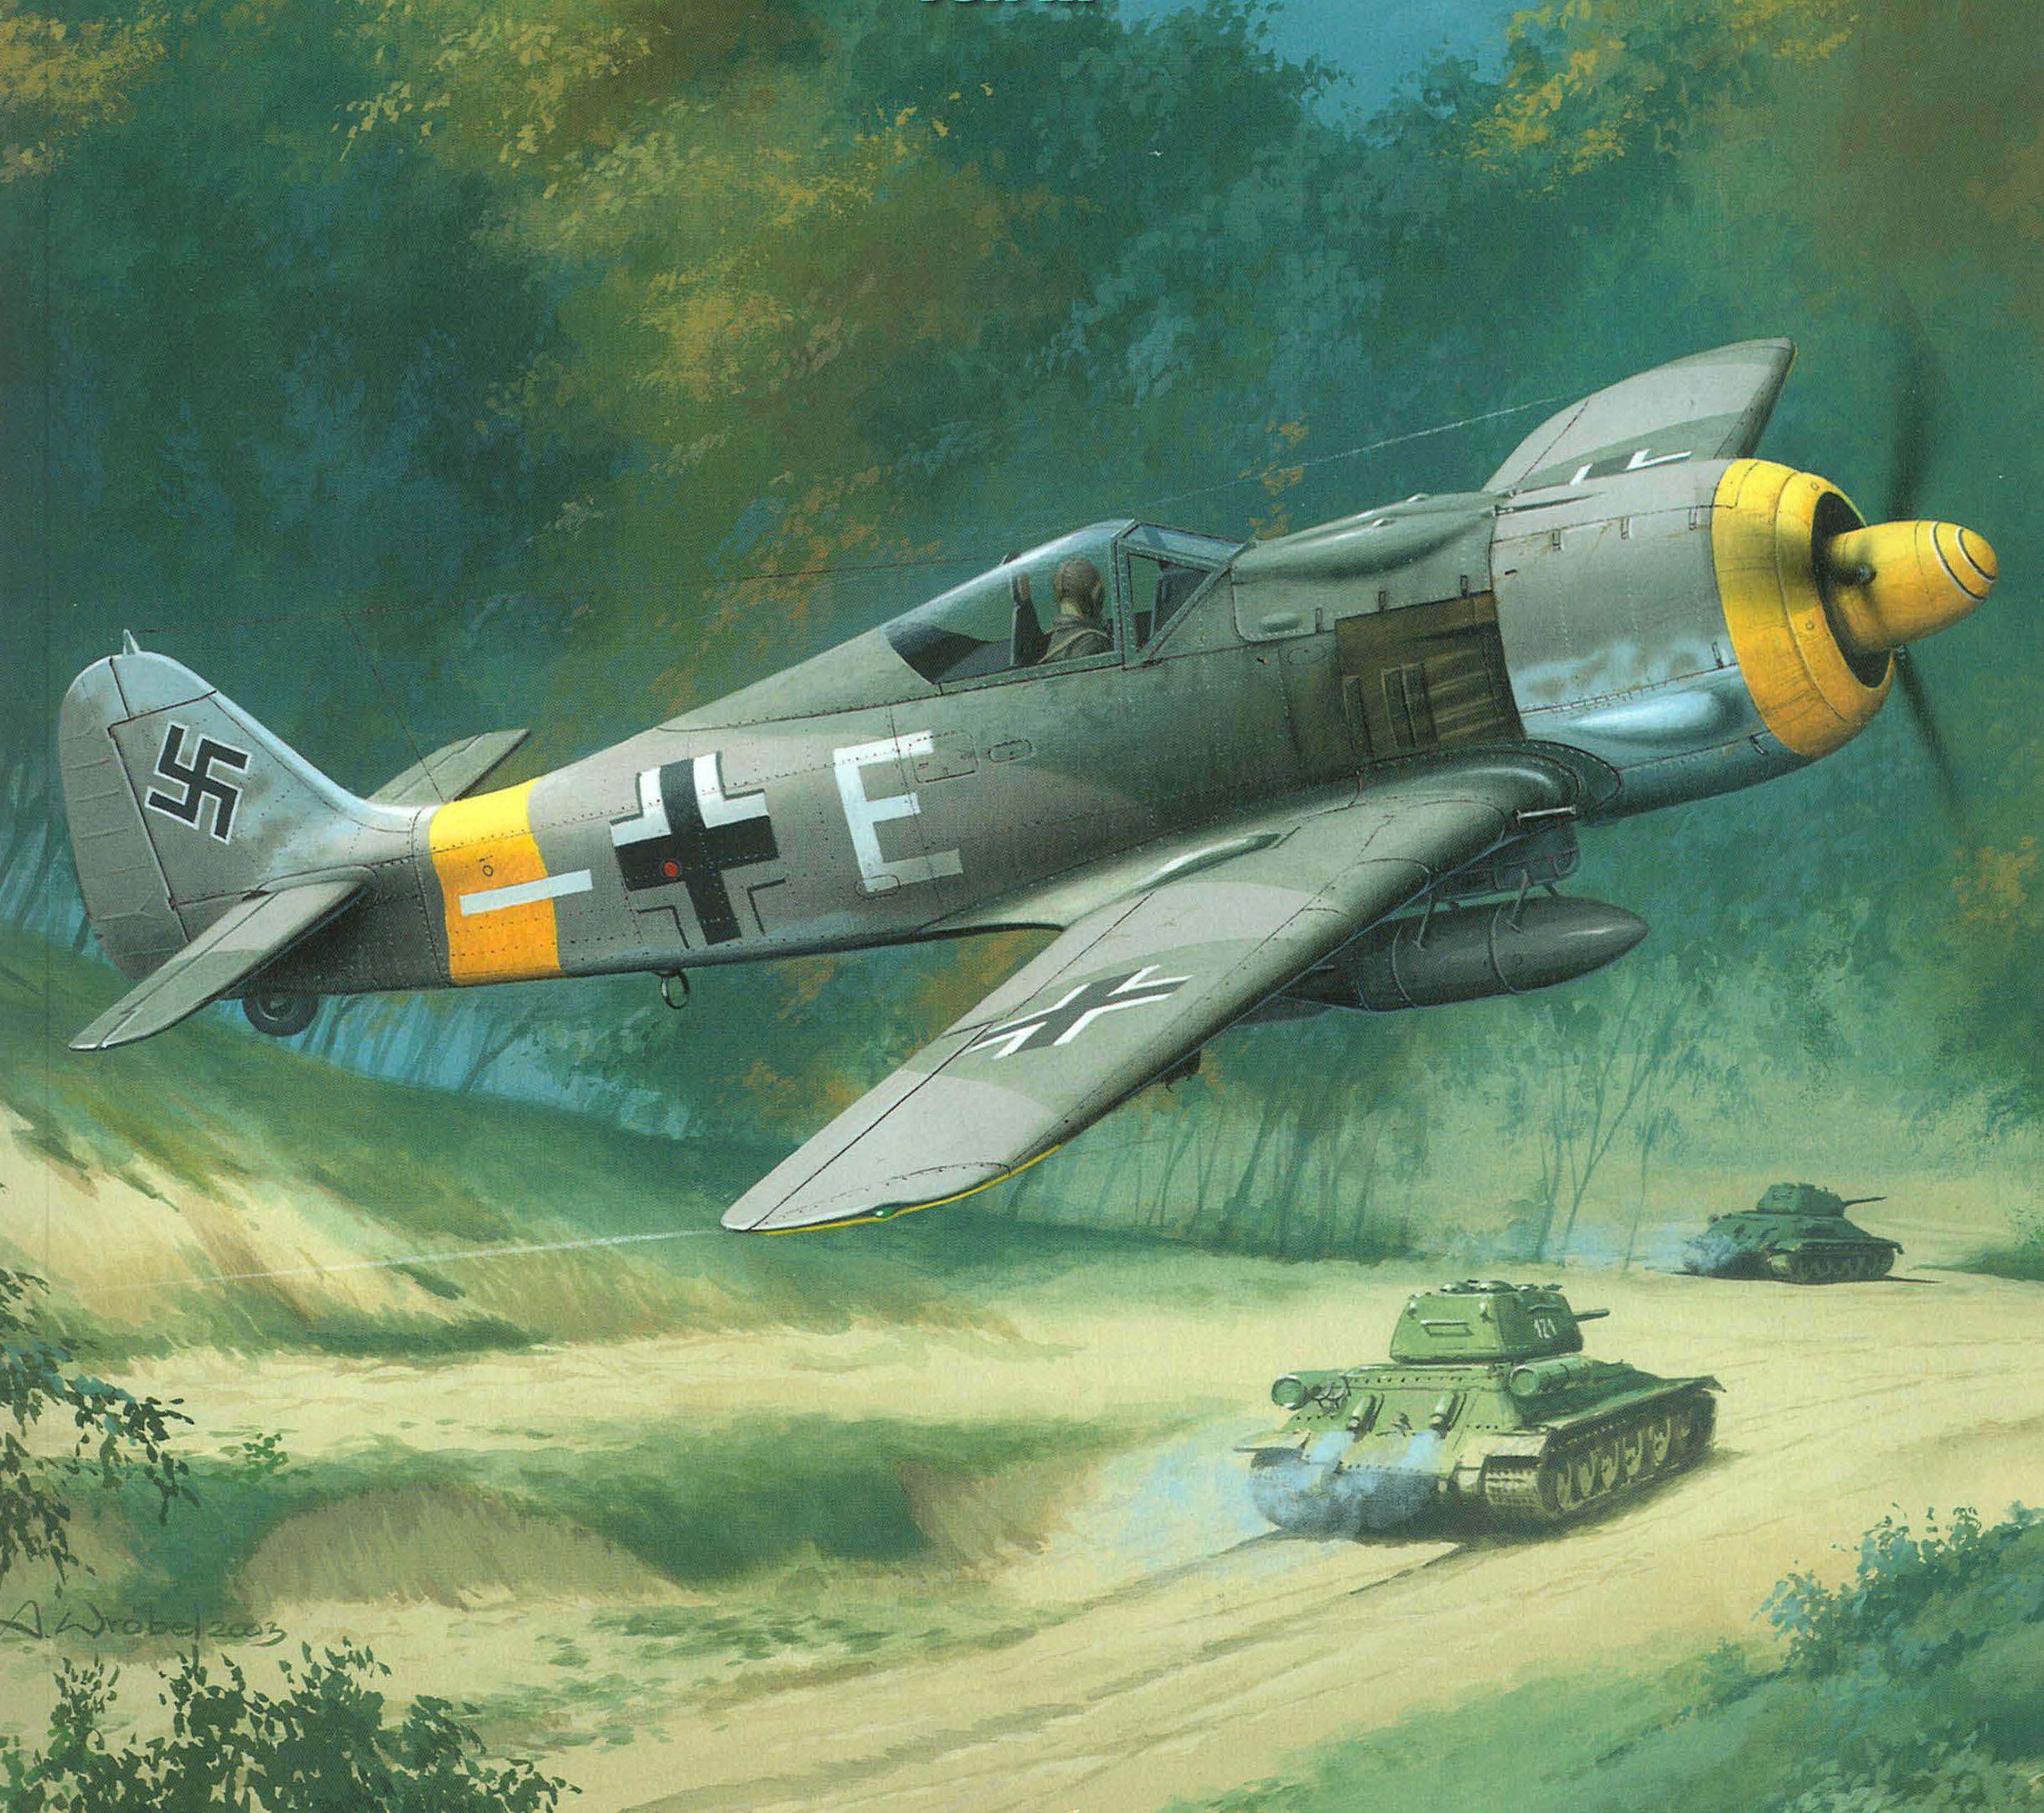 Картинки самолетов танков, максим картинки скрап